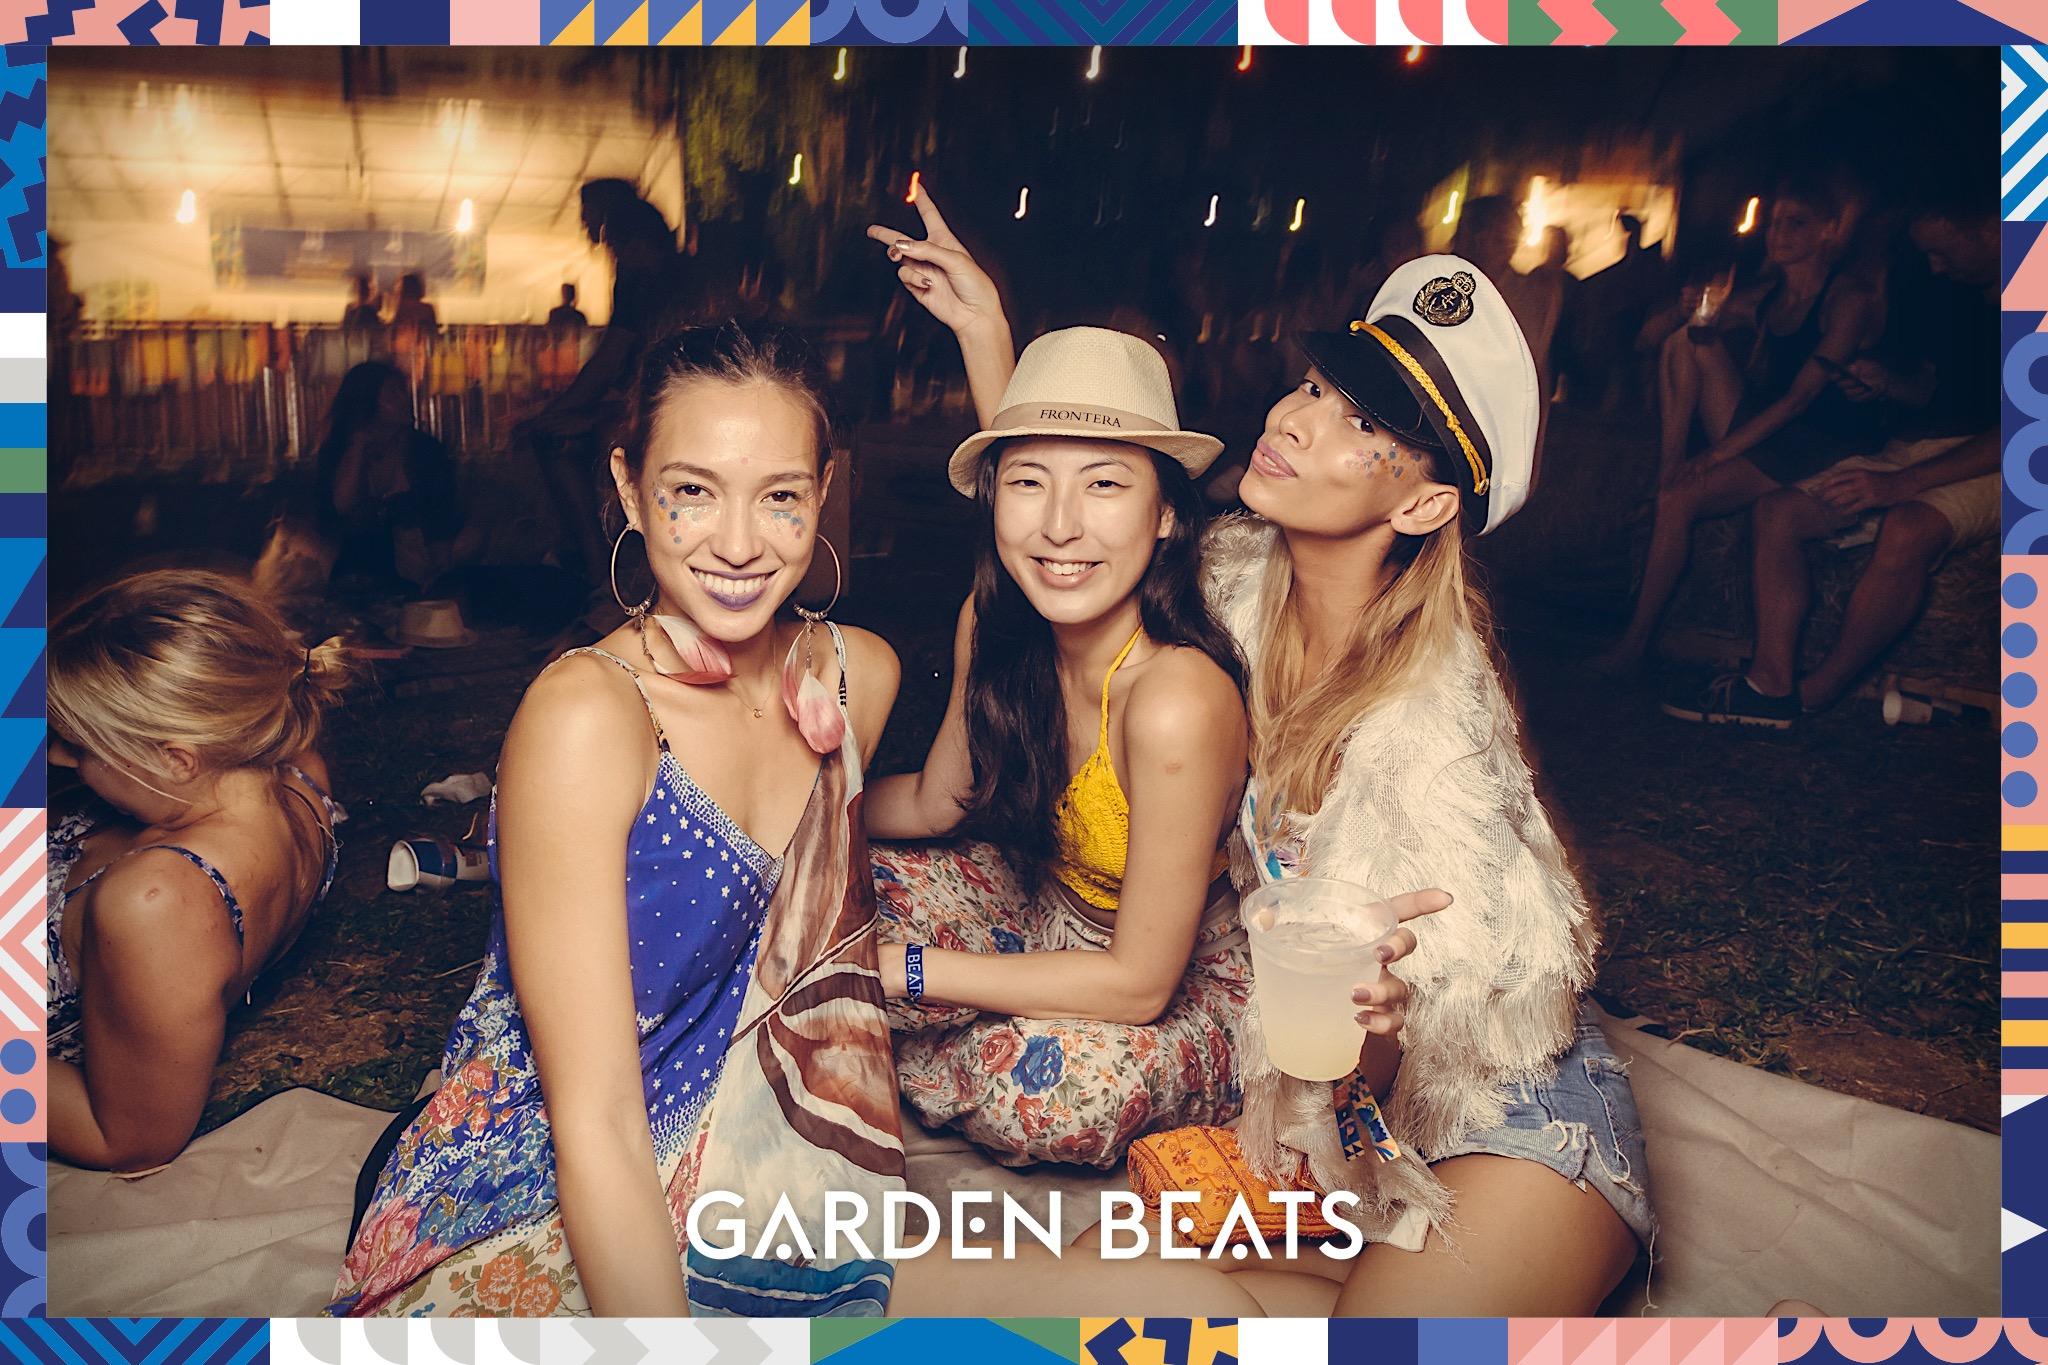 18032017_GardenBeats_Colossal844_WatermarkedGB.jpg